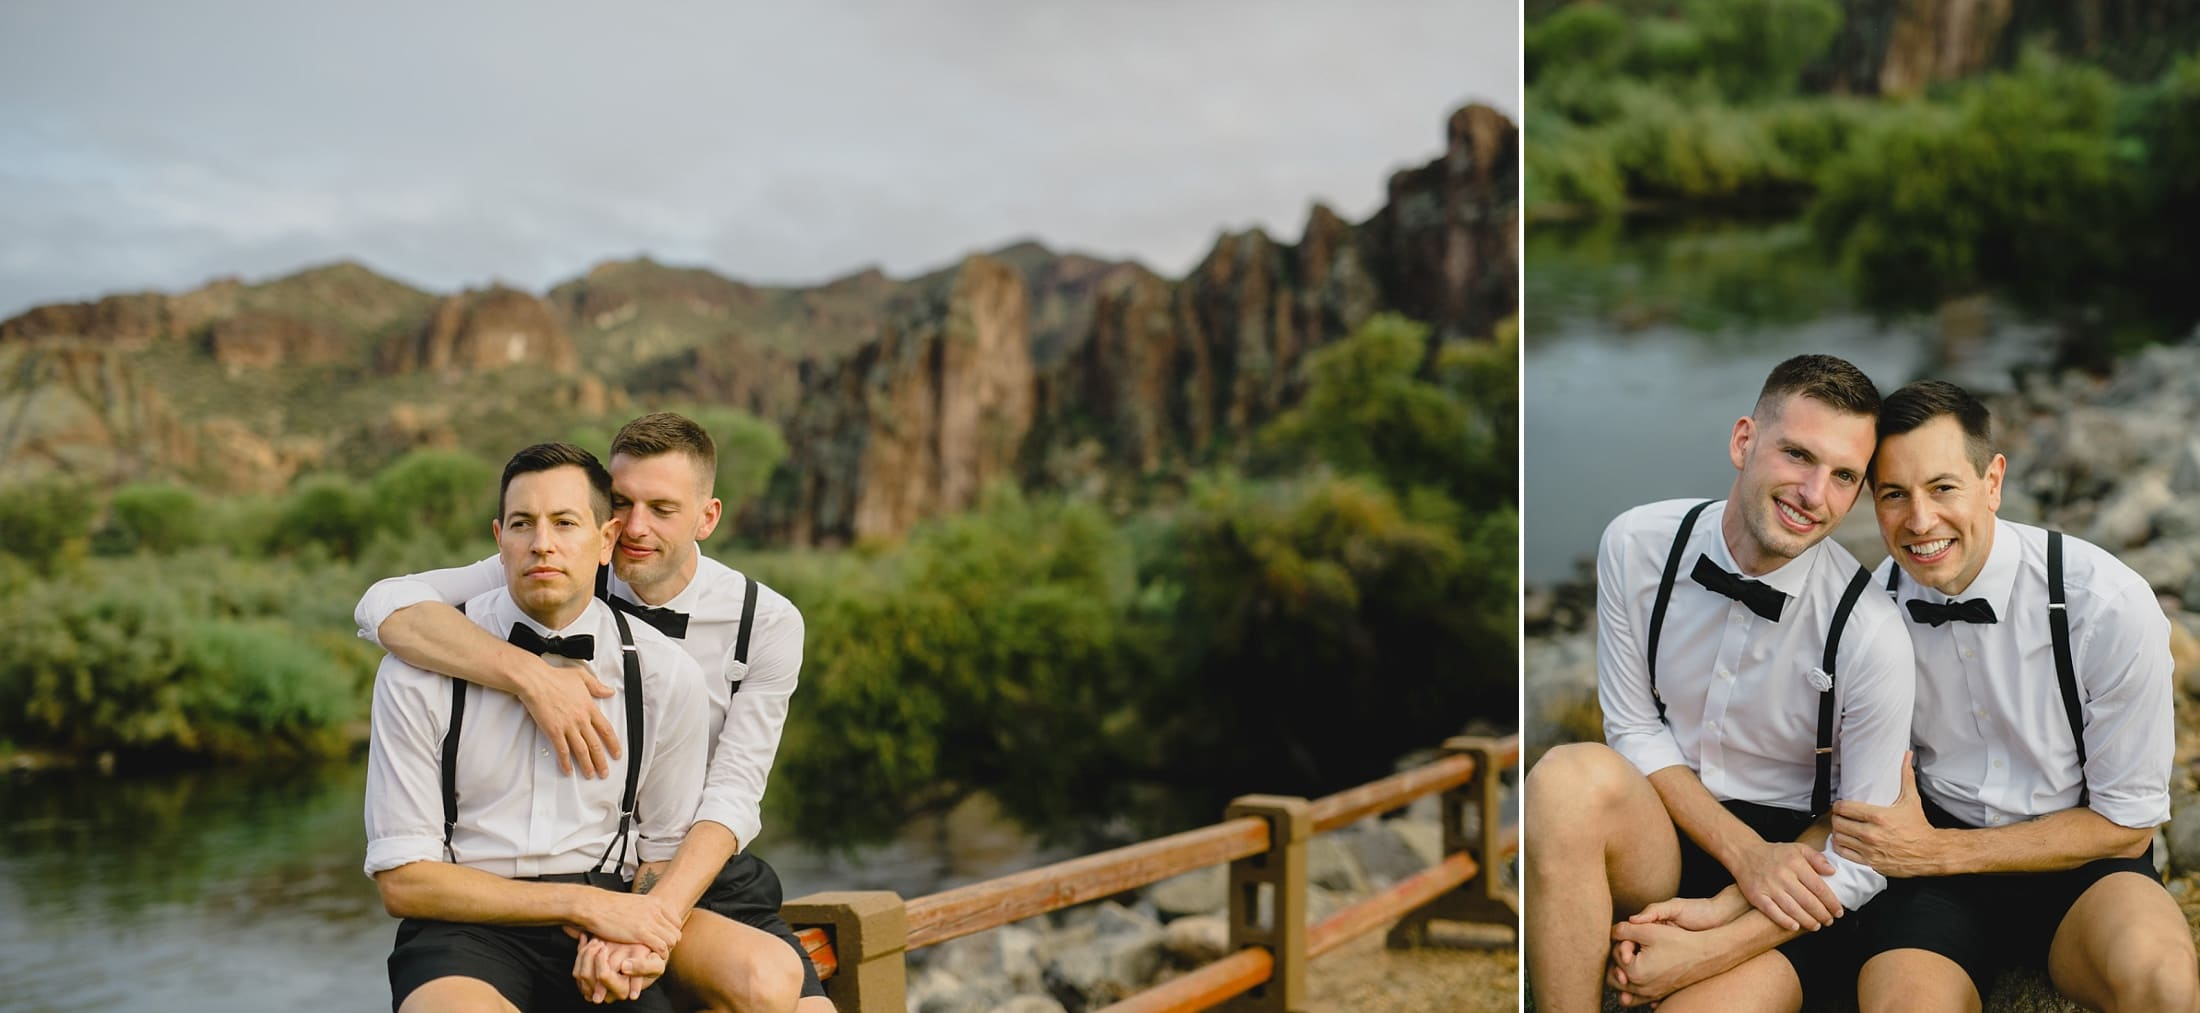 gay wedding at Saguaro Lake Ranch Arizona